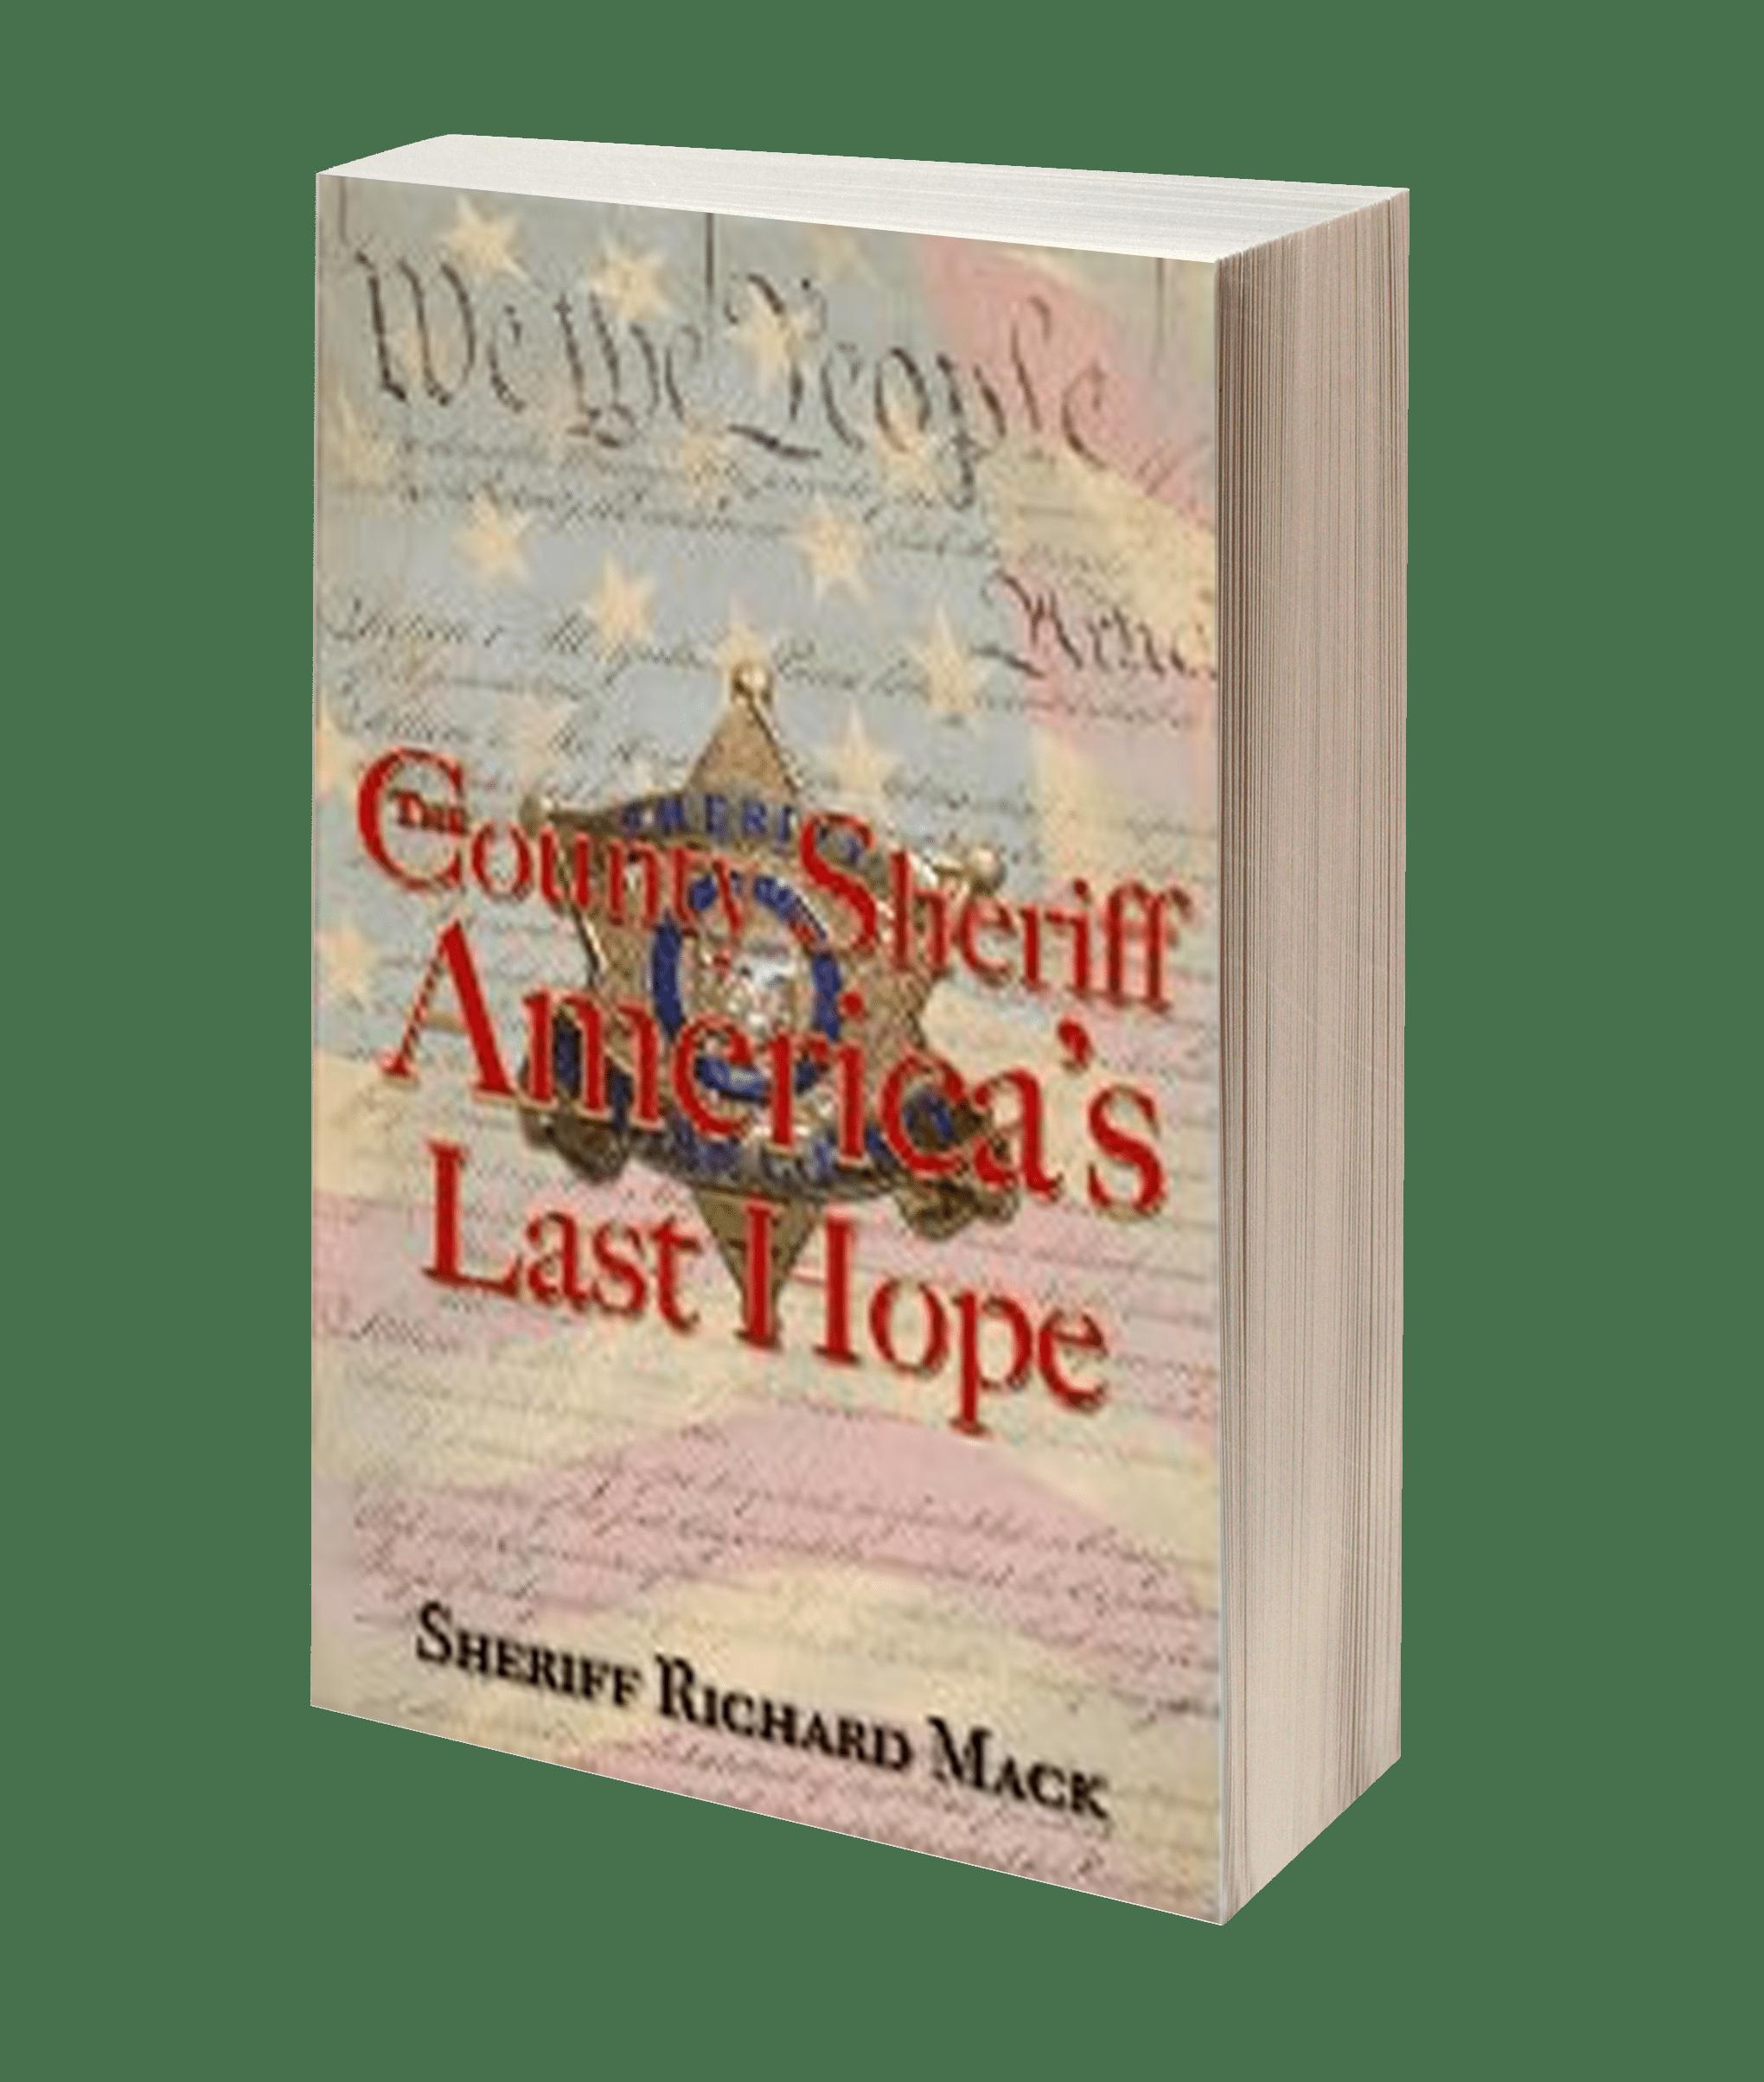 County Sheriff Americas Last Hope